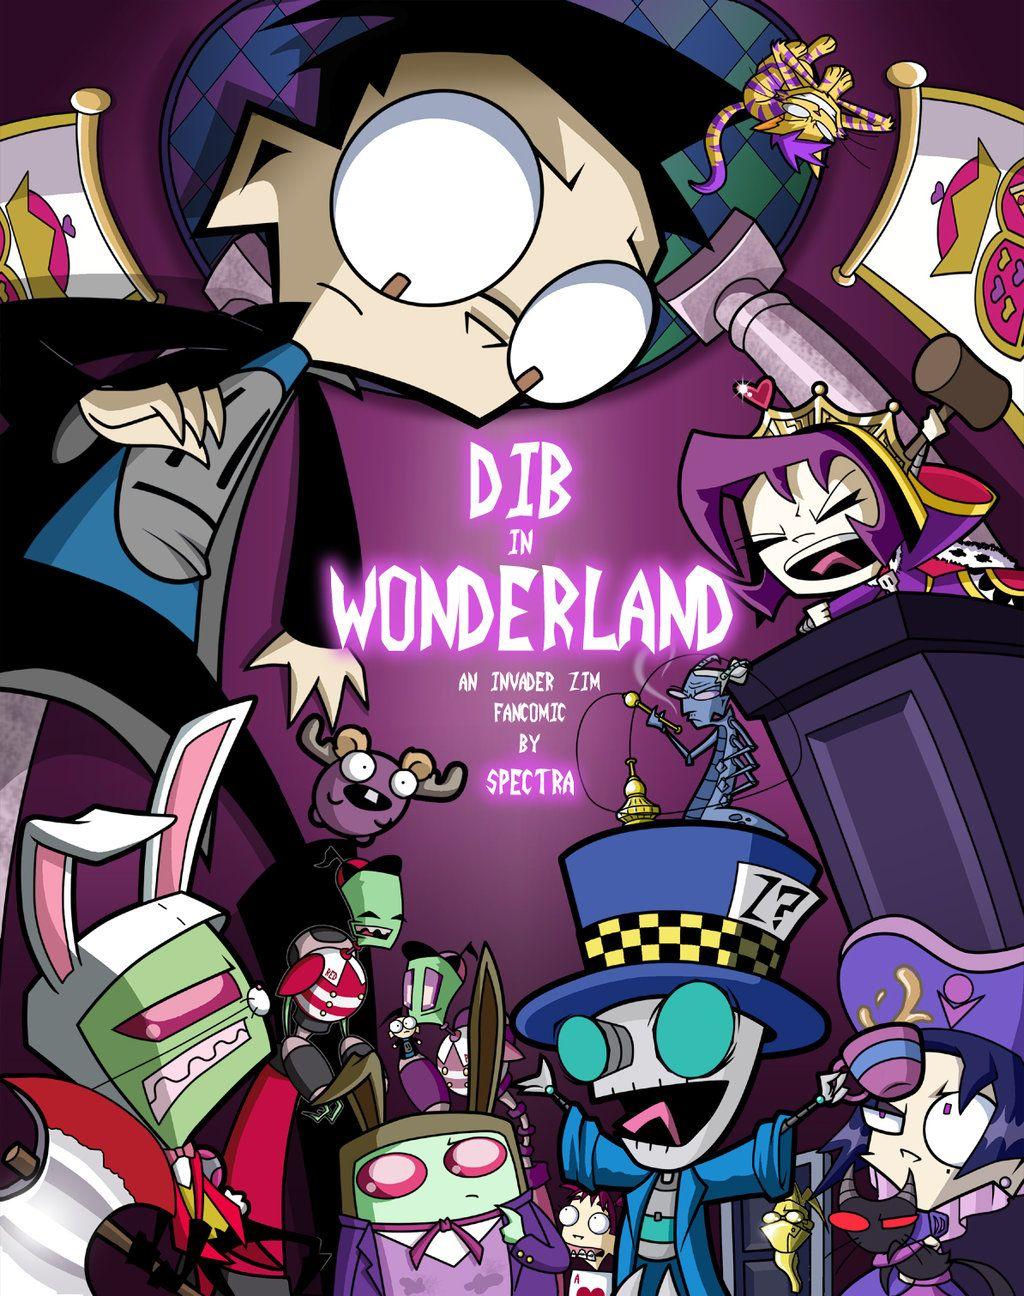 Invader Zim Fan Comics Dib in Wonderland Comi...